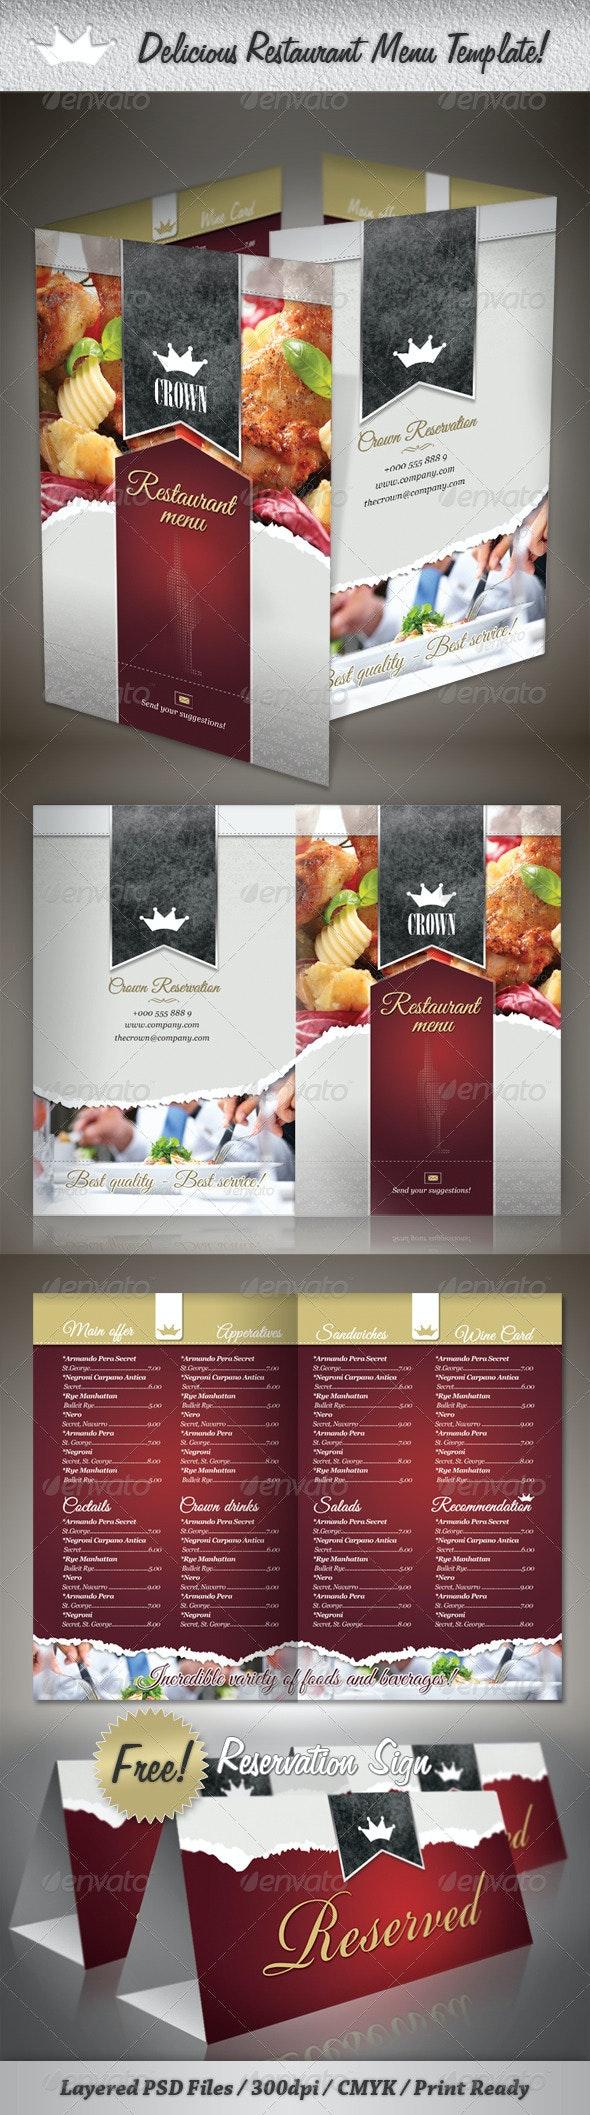 Delicious Restaurant Menu Template - Food Menus Print Templates